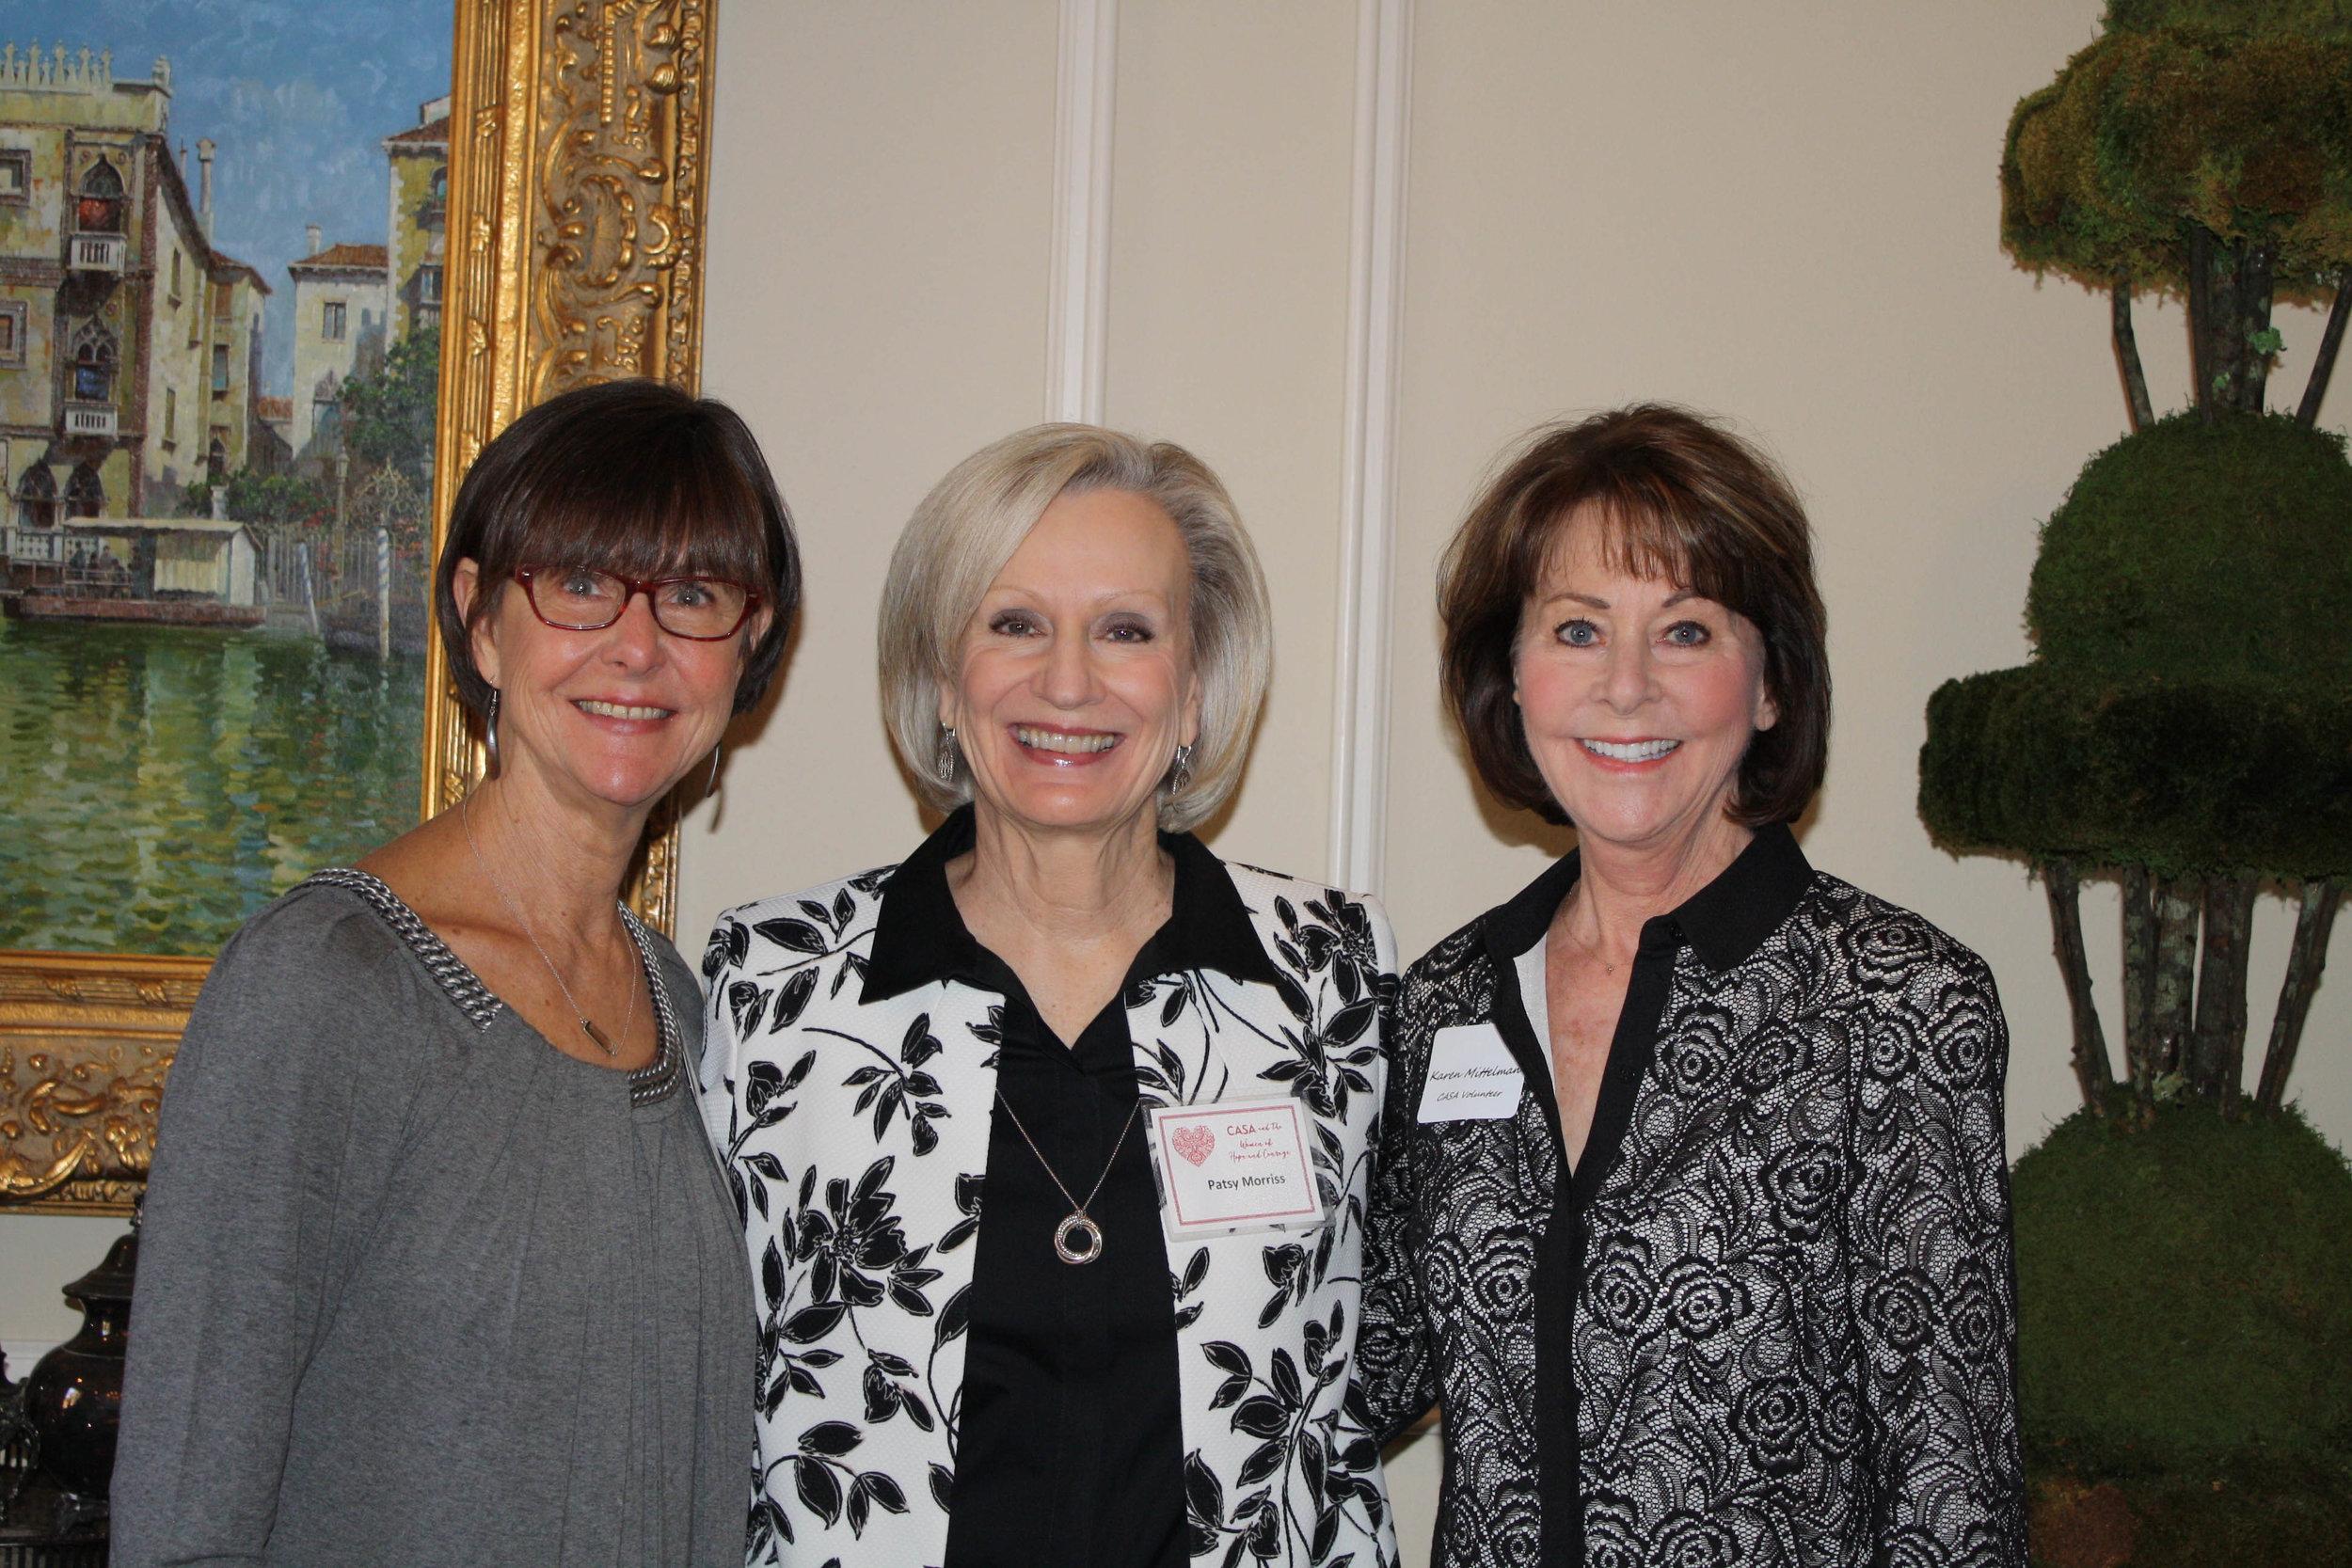 Debbie Alkire, Patsy Morriss and Karen Mittelman